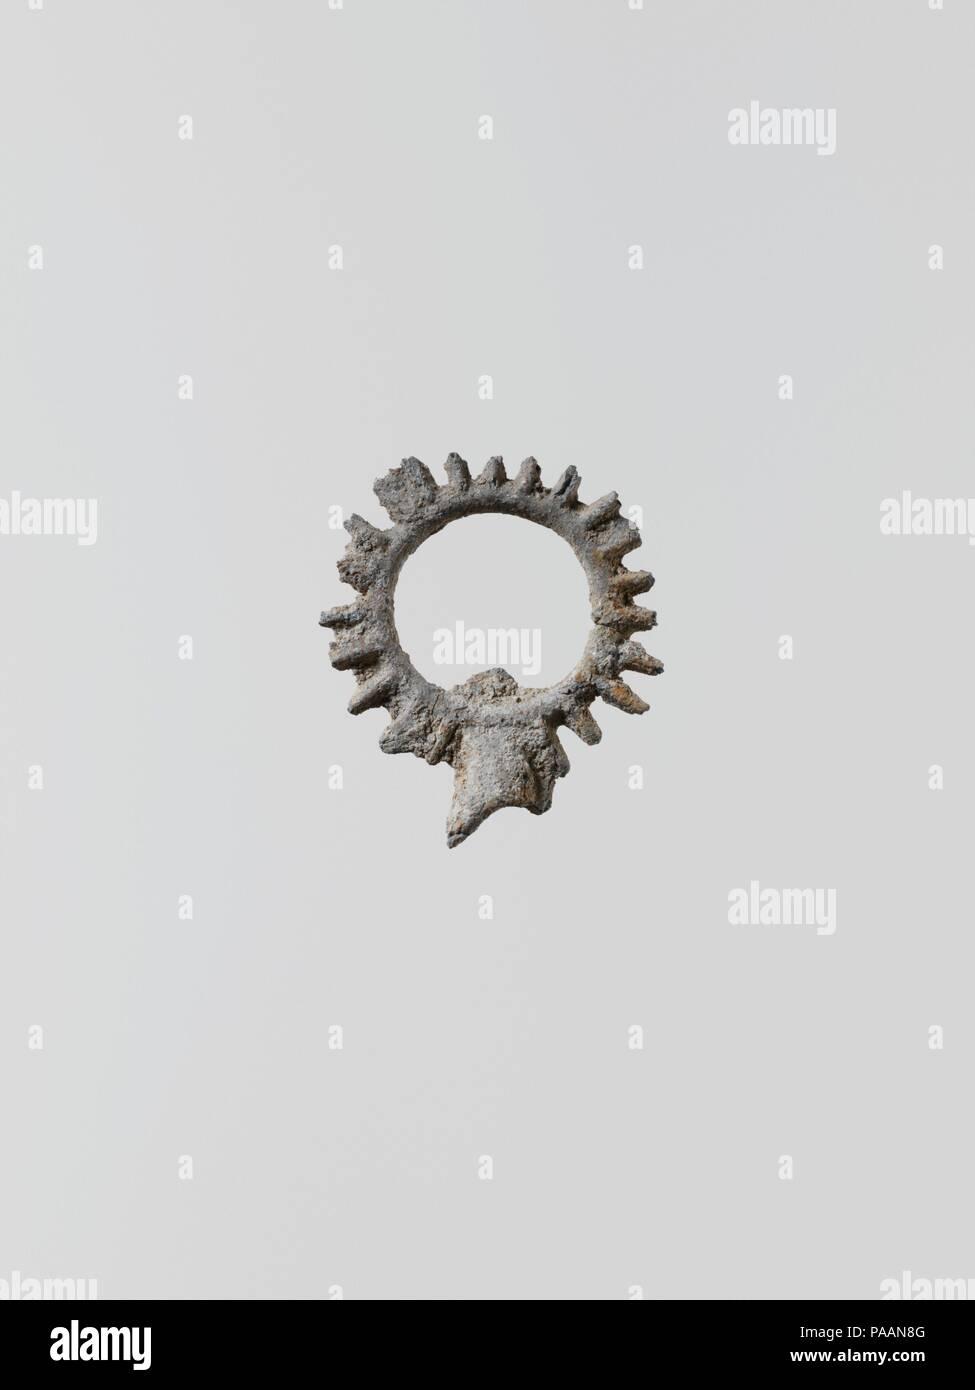 Wreaths, 11. Culture: Greek, Laconian. Dimensions: 15/16 × 3/4 in. (2.3 × 2 cm). Museum: Metropolitan Museum of Art, New York, USA. Stock Photo